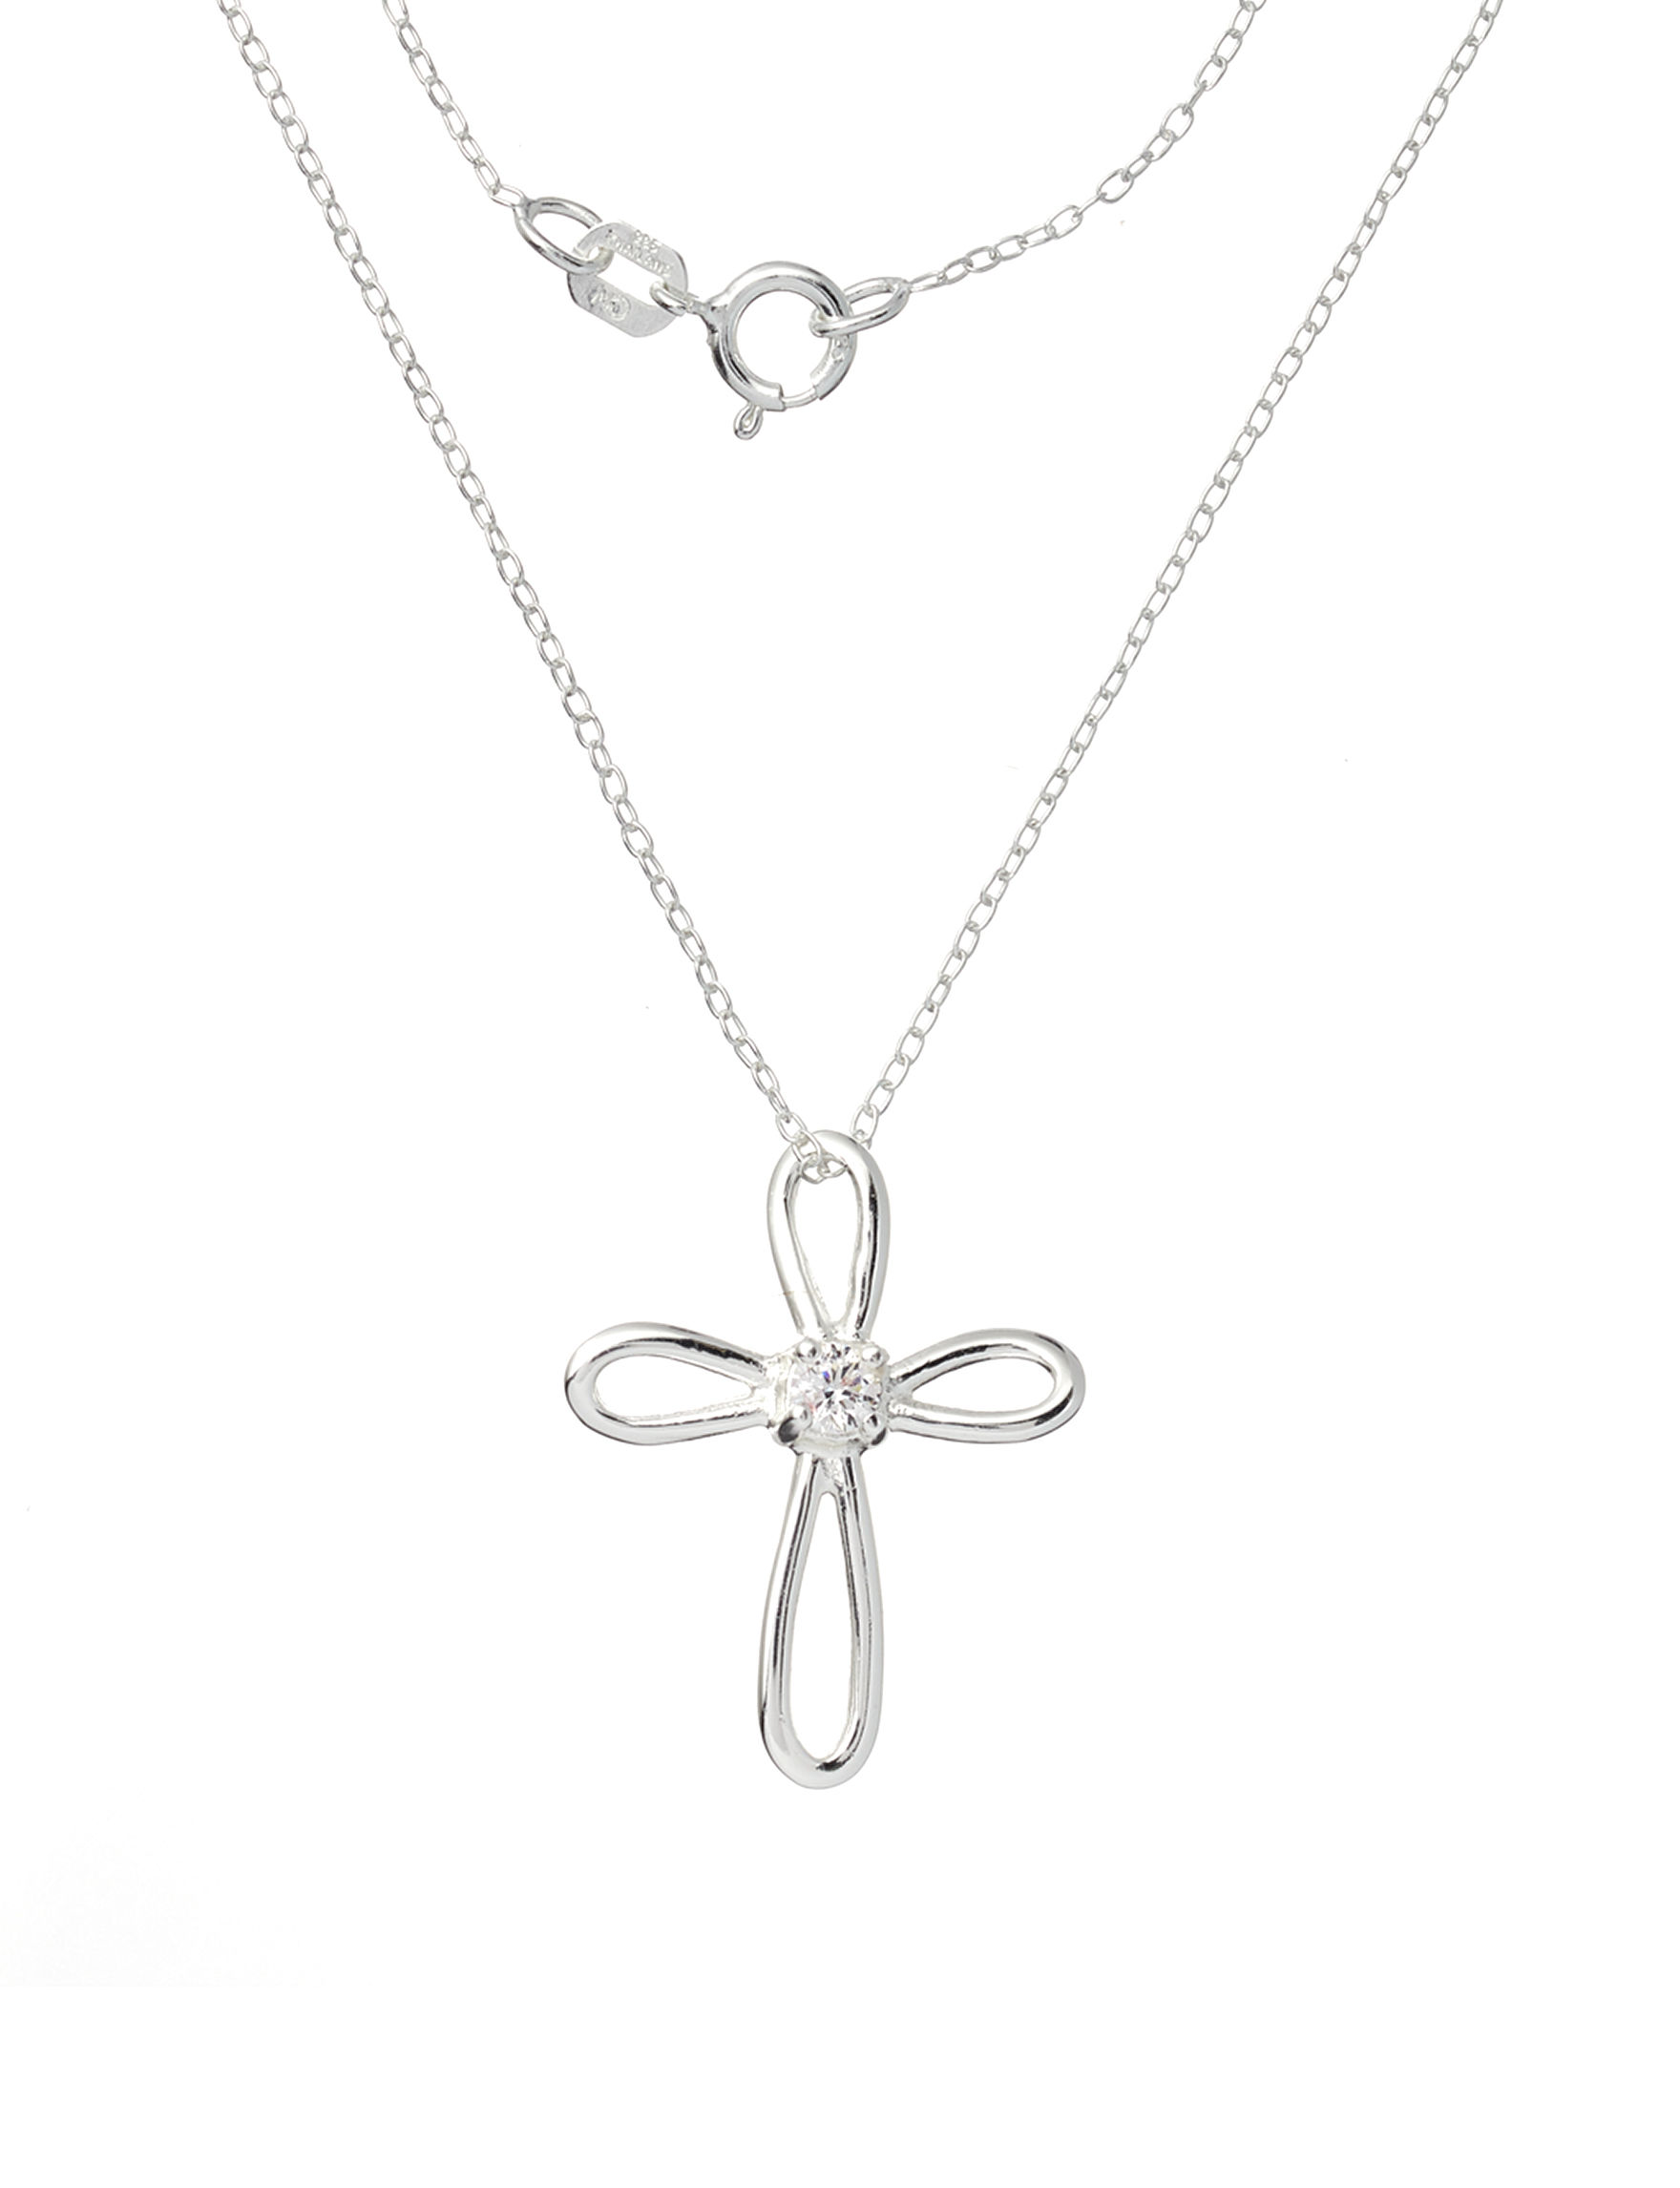 Marsala Silver / Crystal Necklaces & Pendants Fine Jewelry